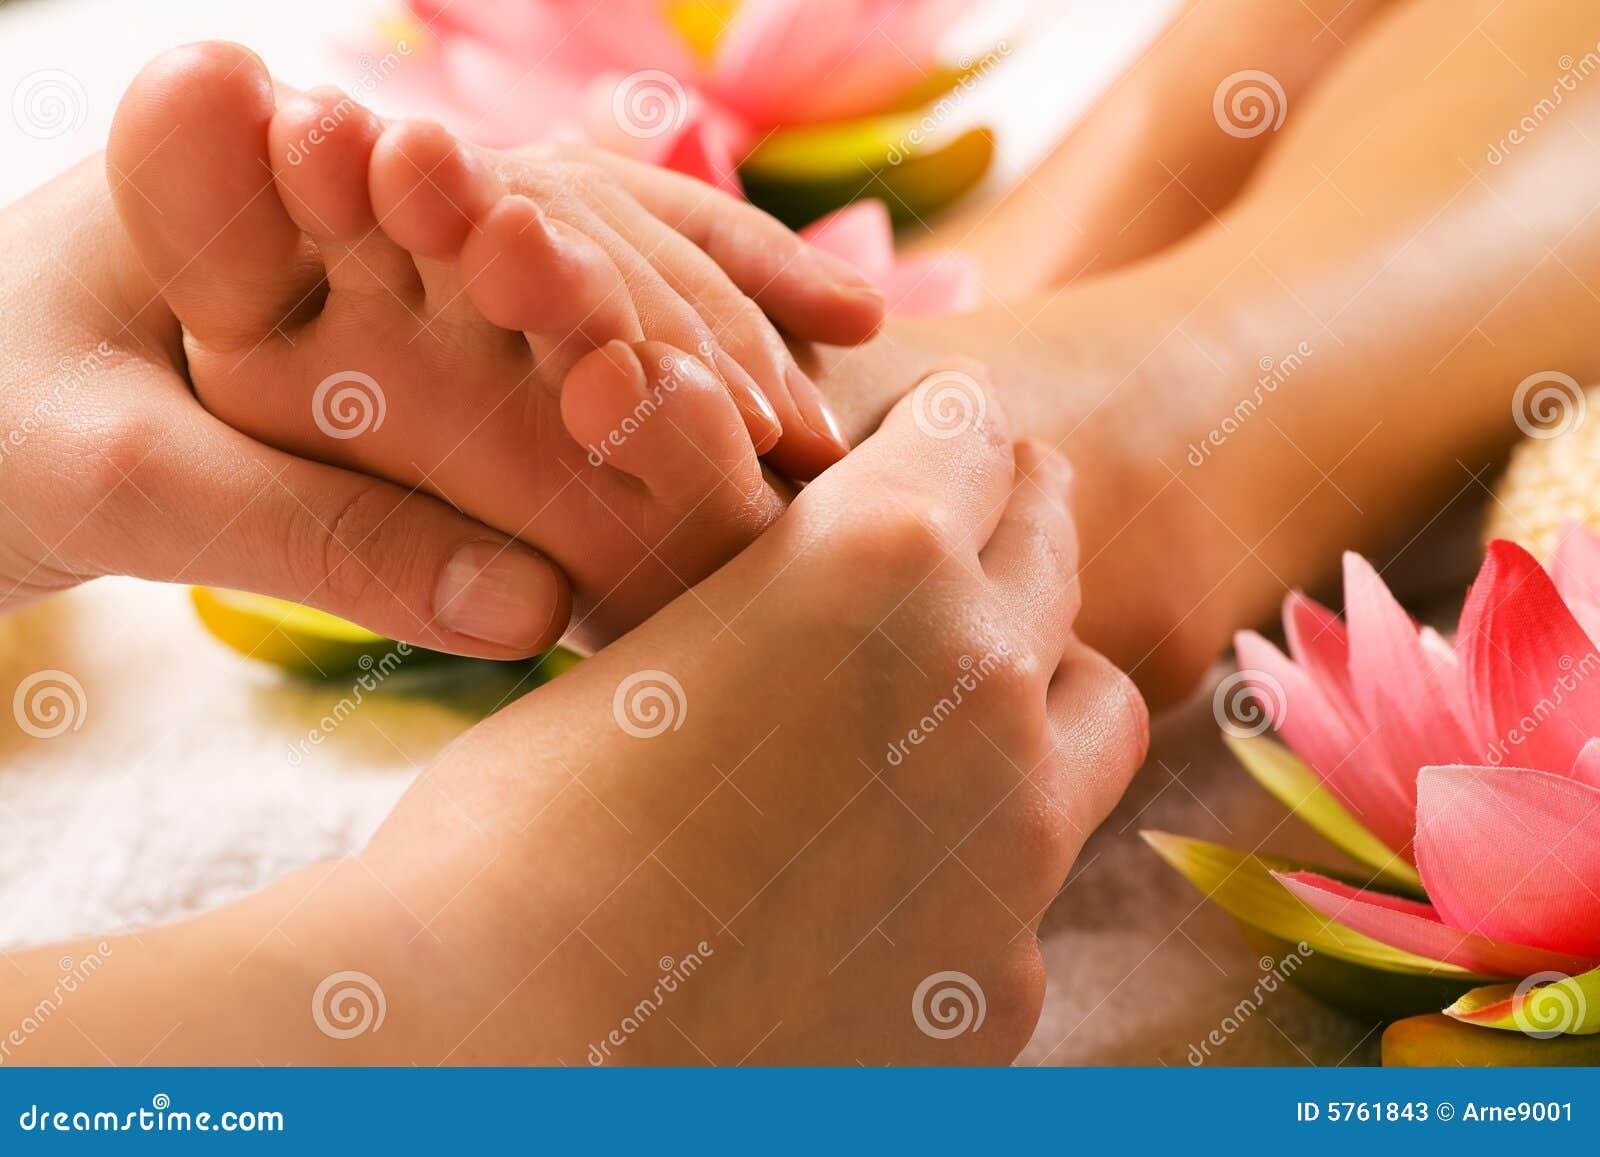 ноги массажа